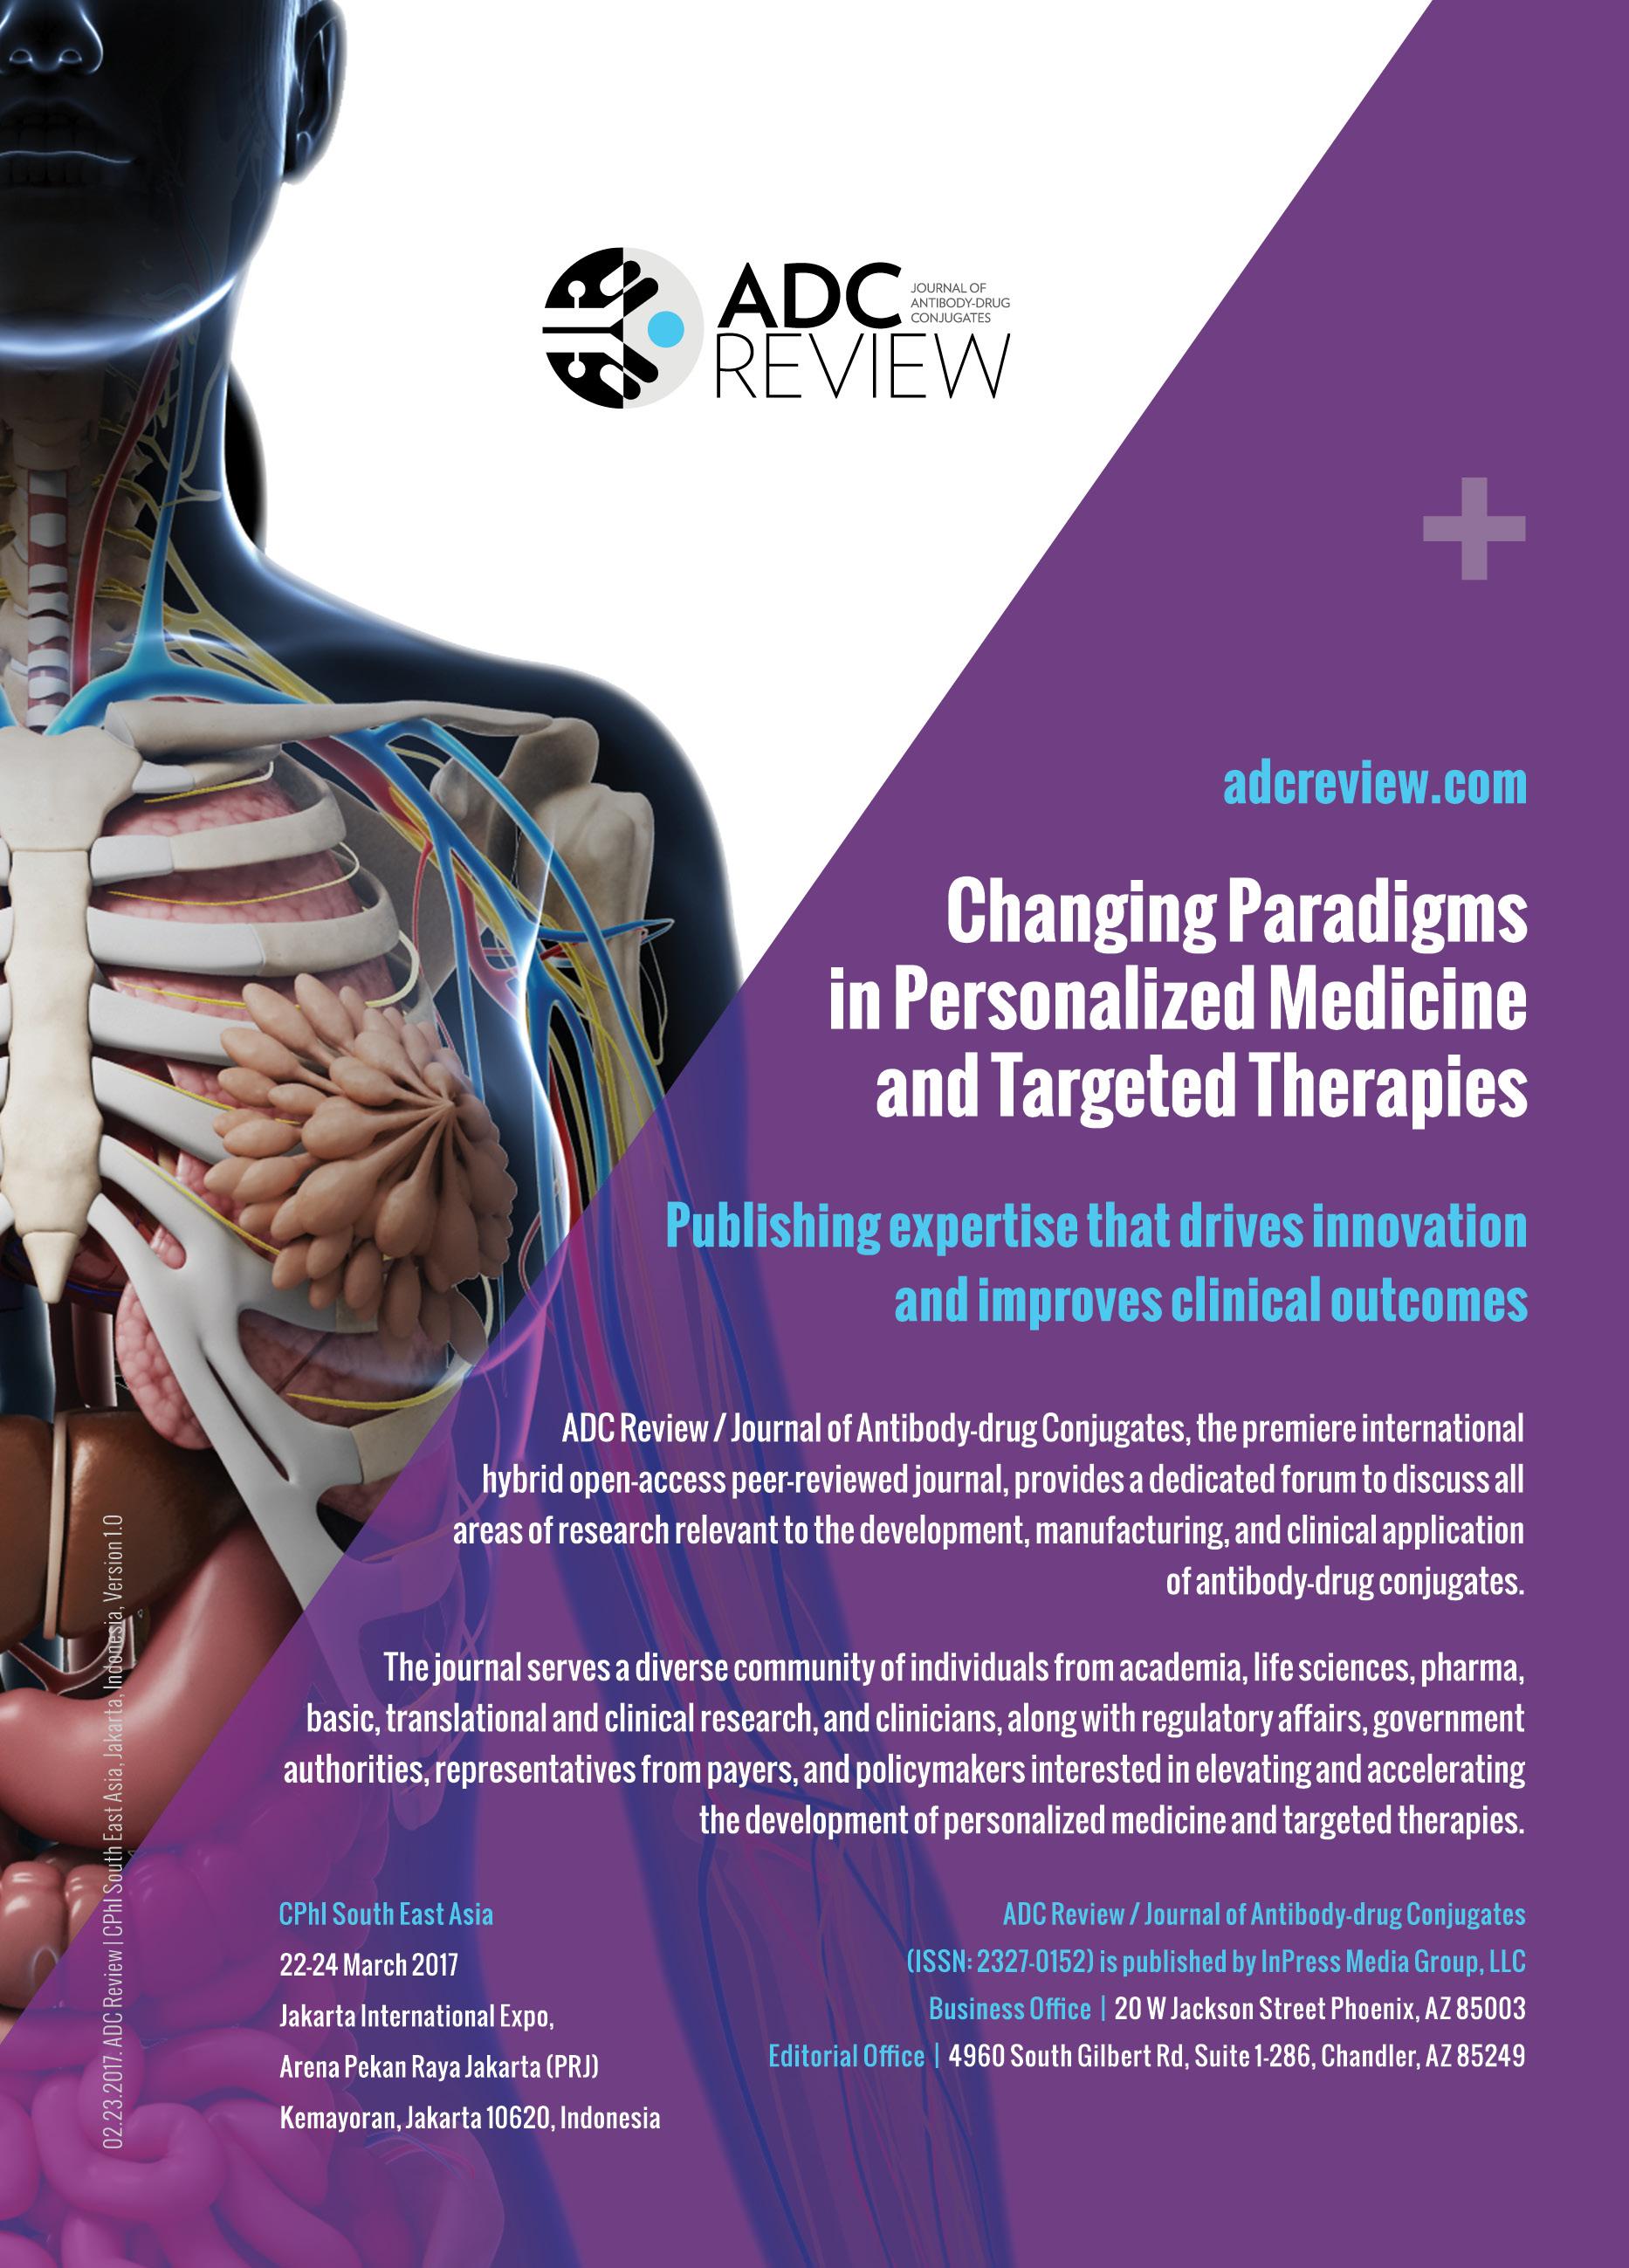 ADC Review, Journal of Antibody-drug Conjugates